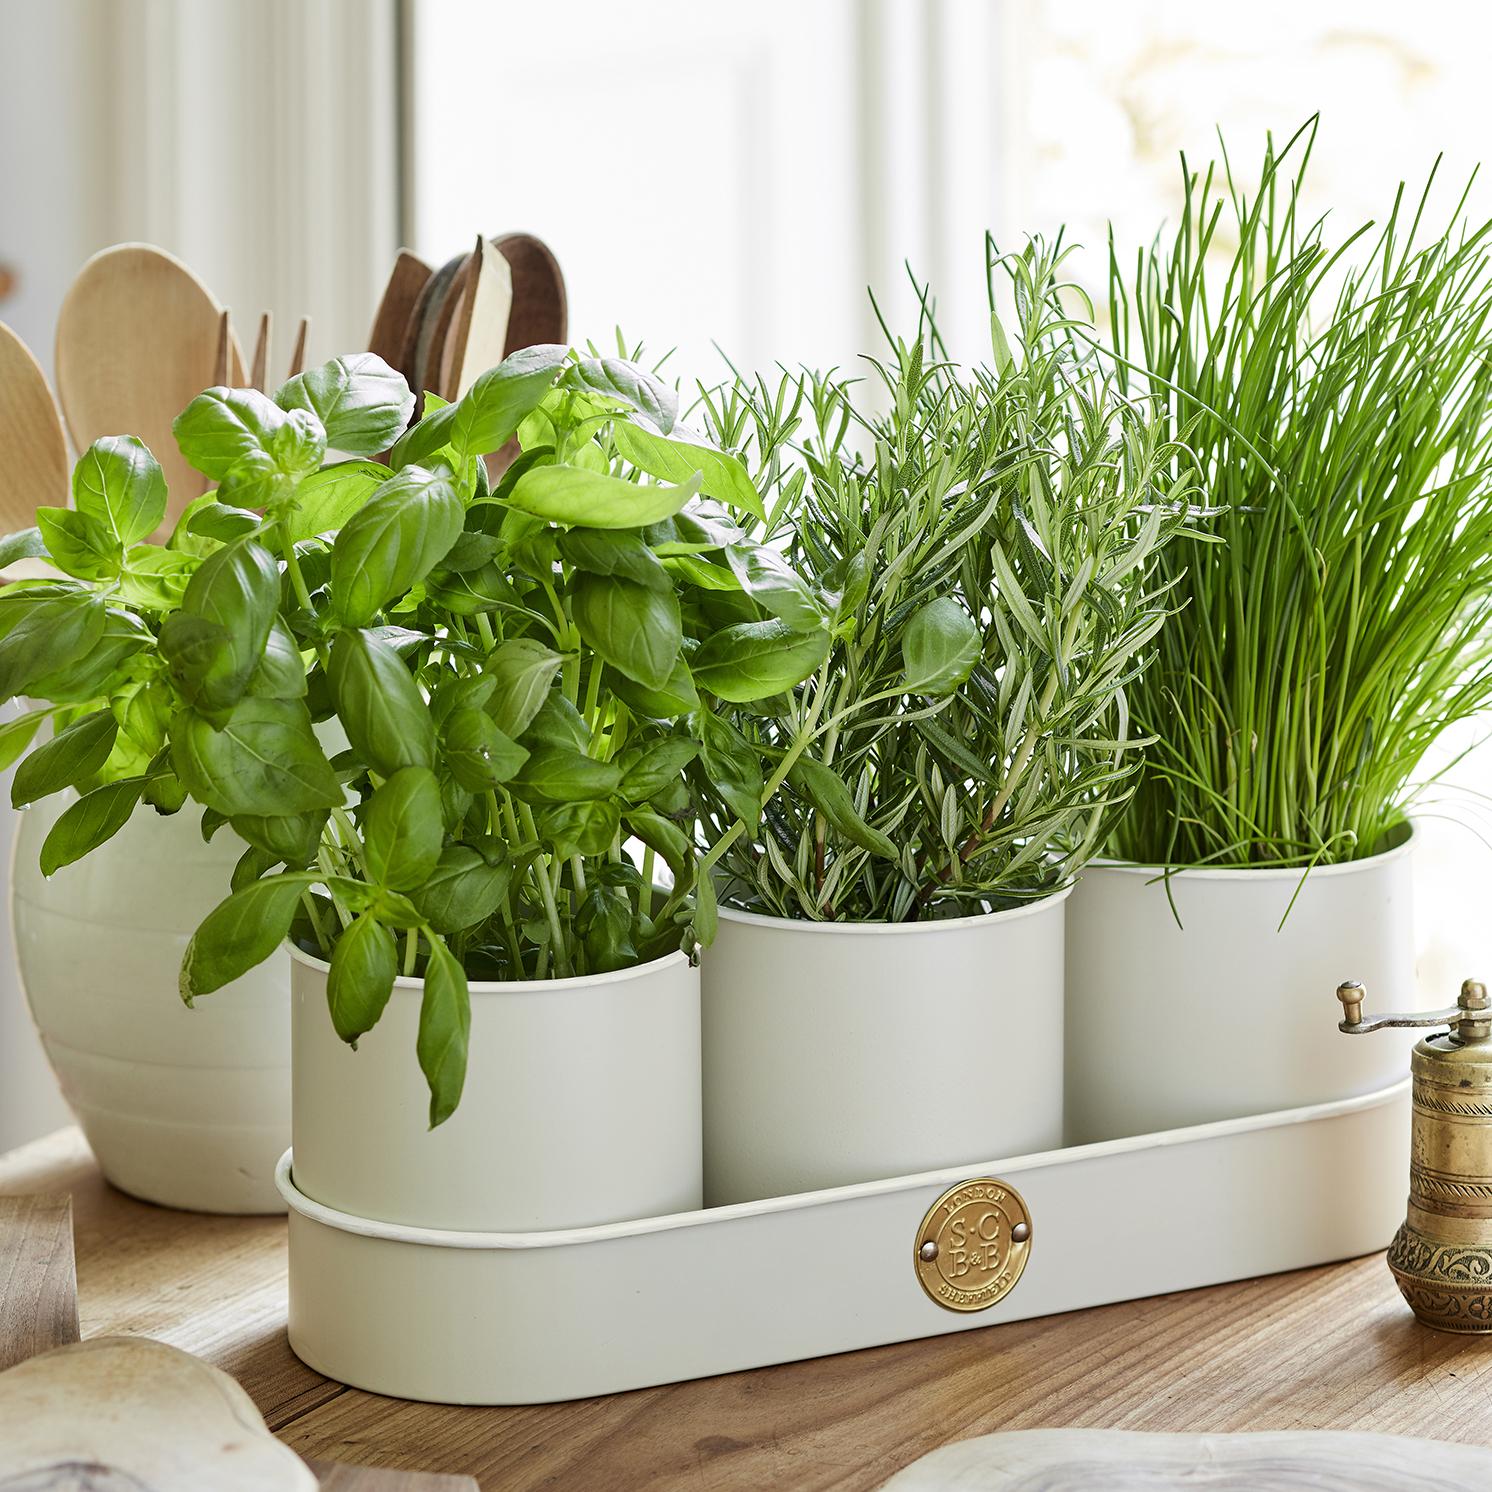 Burgon & Ball – Sophie Conran Buttermilk Herb Pots